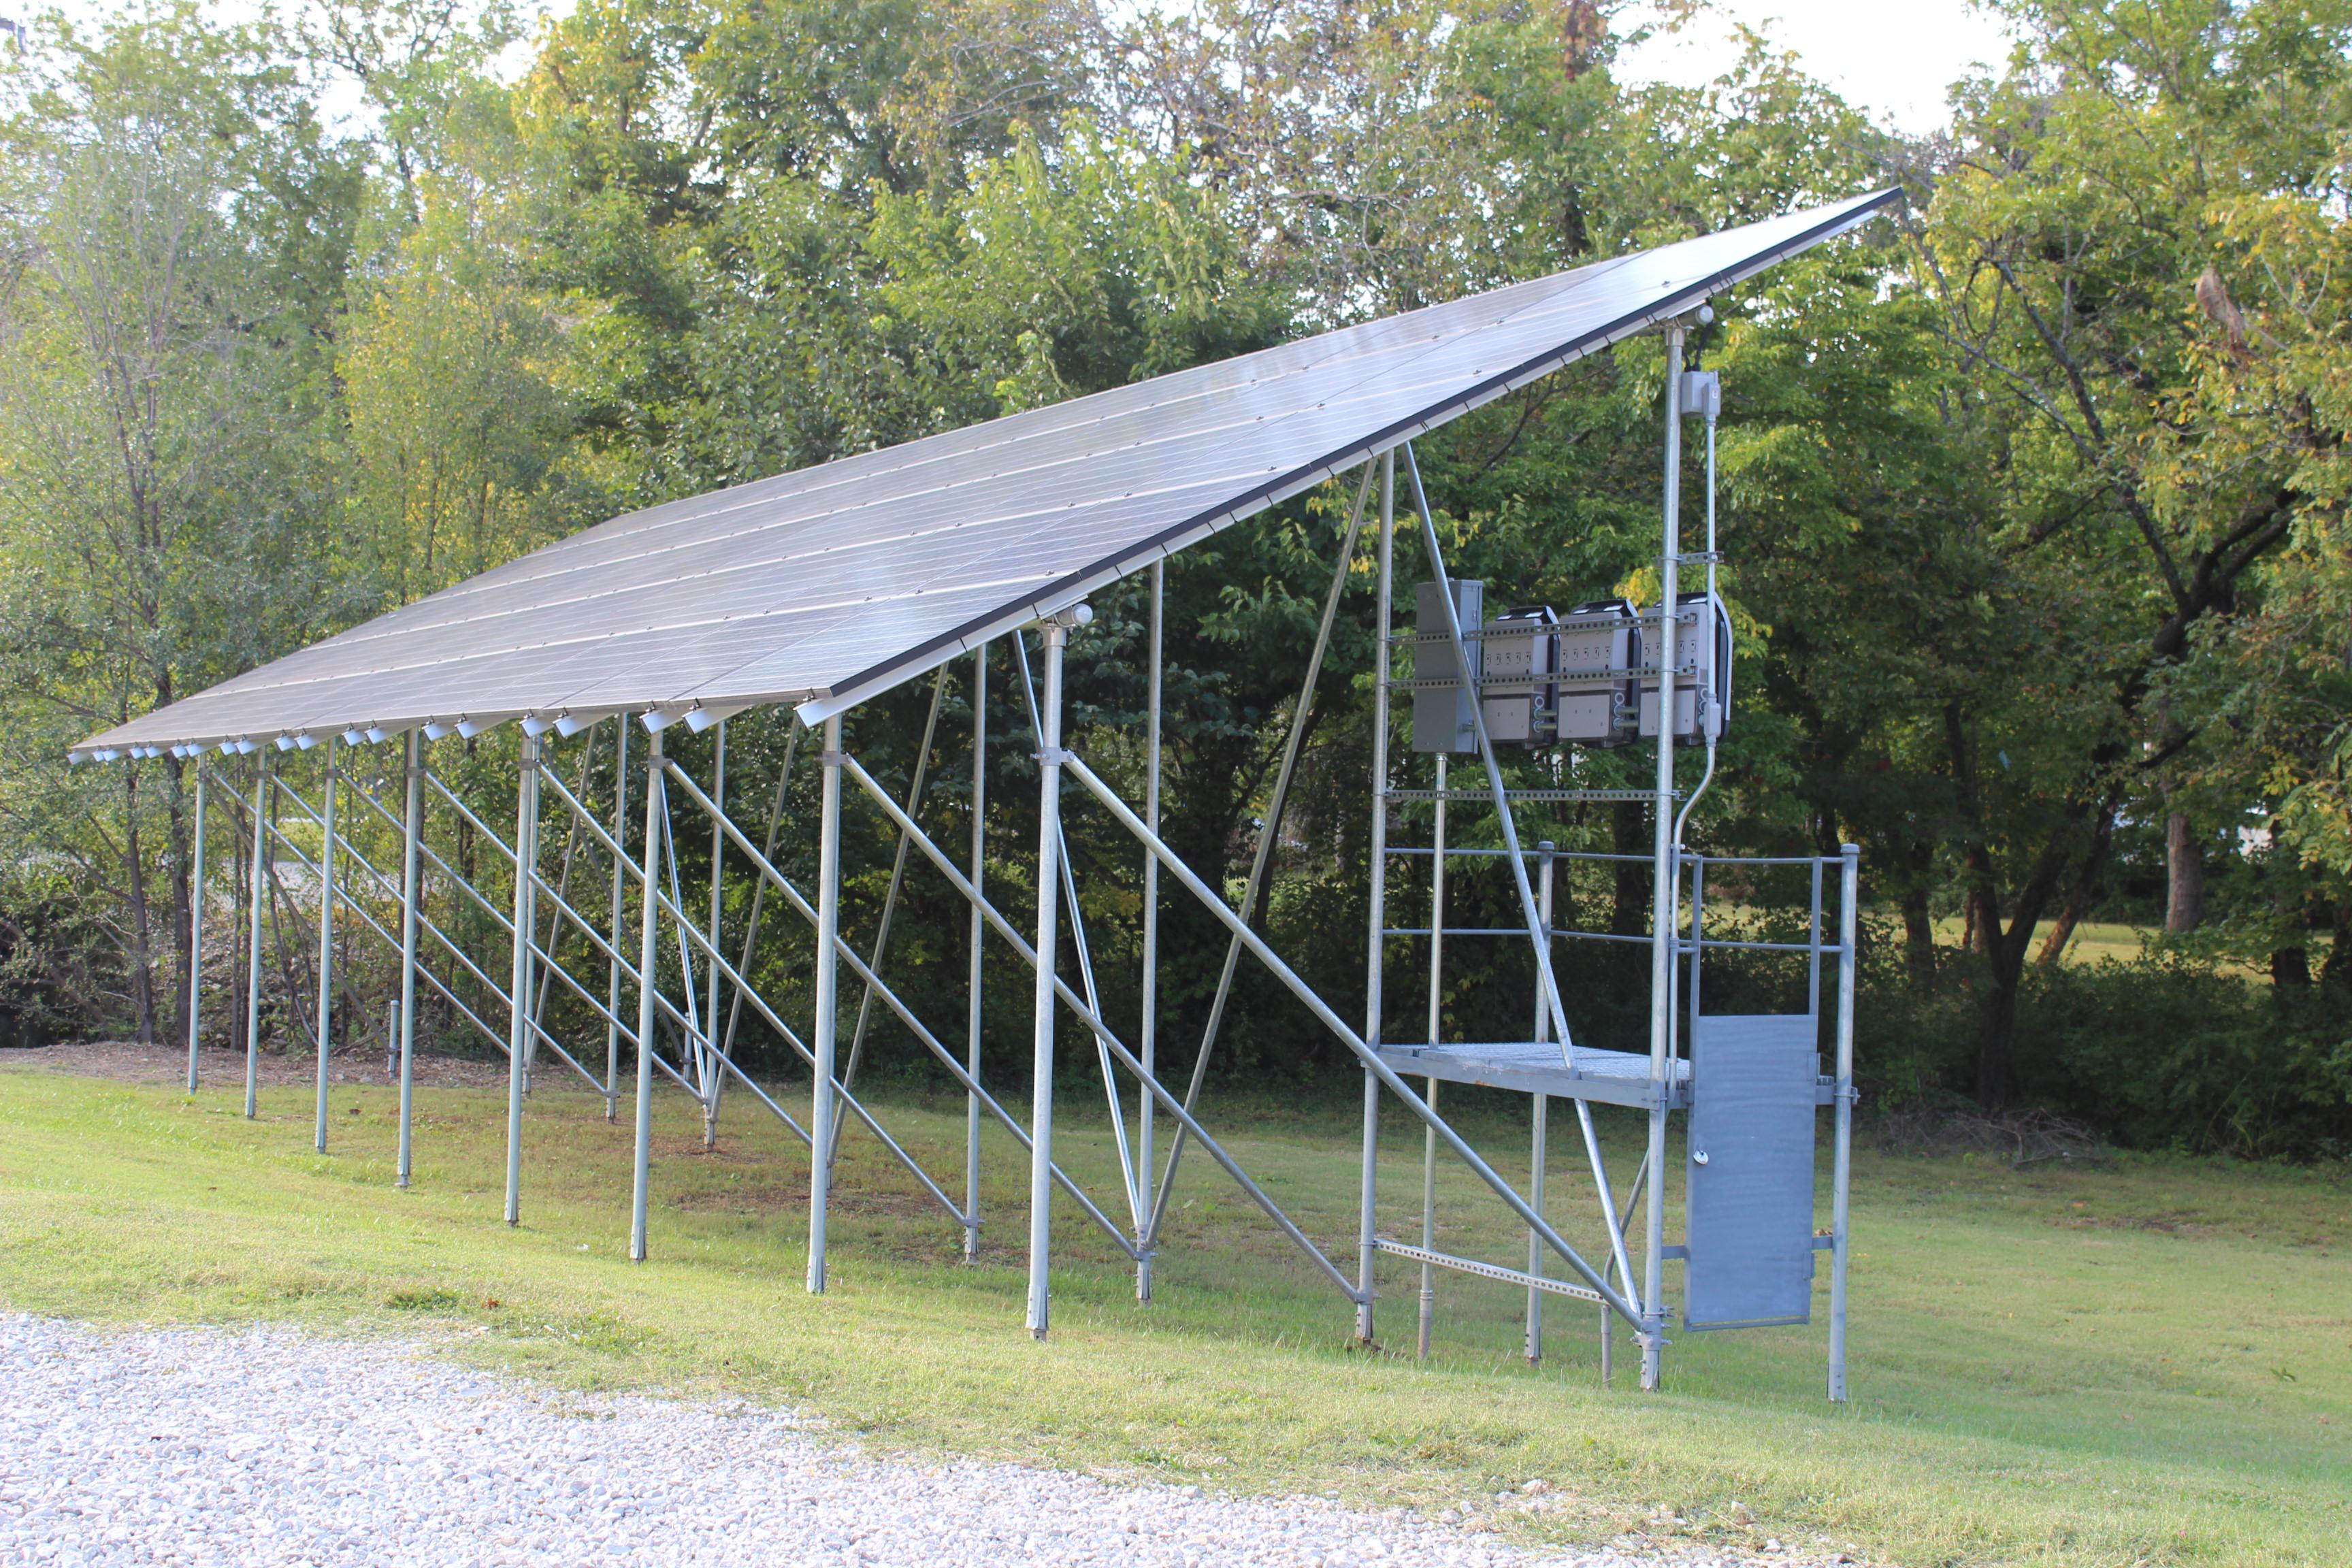 PE46-Hex Penetrators anchor solar ground mount instead of concrete footings